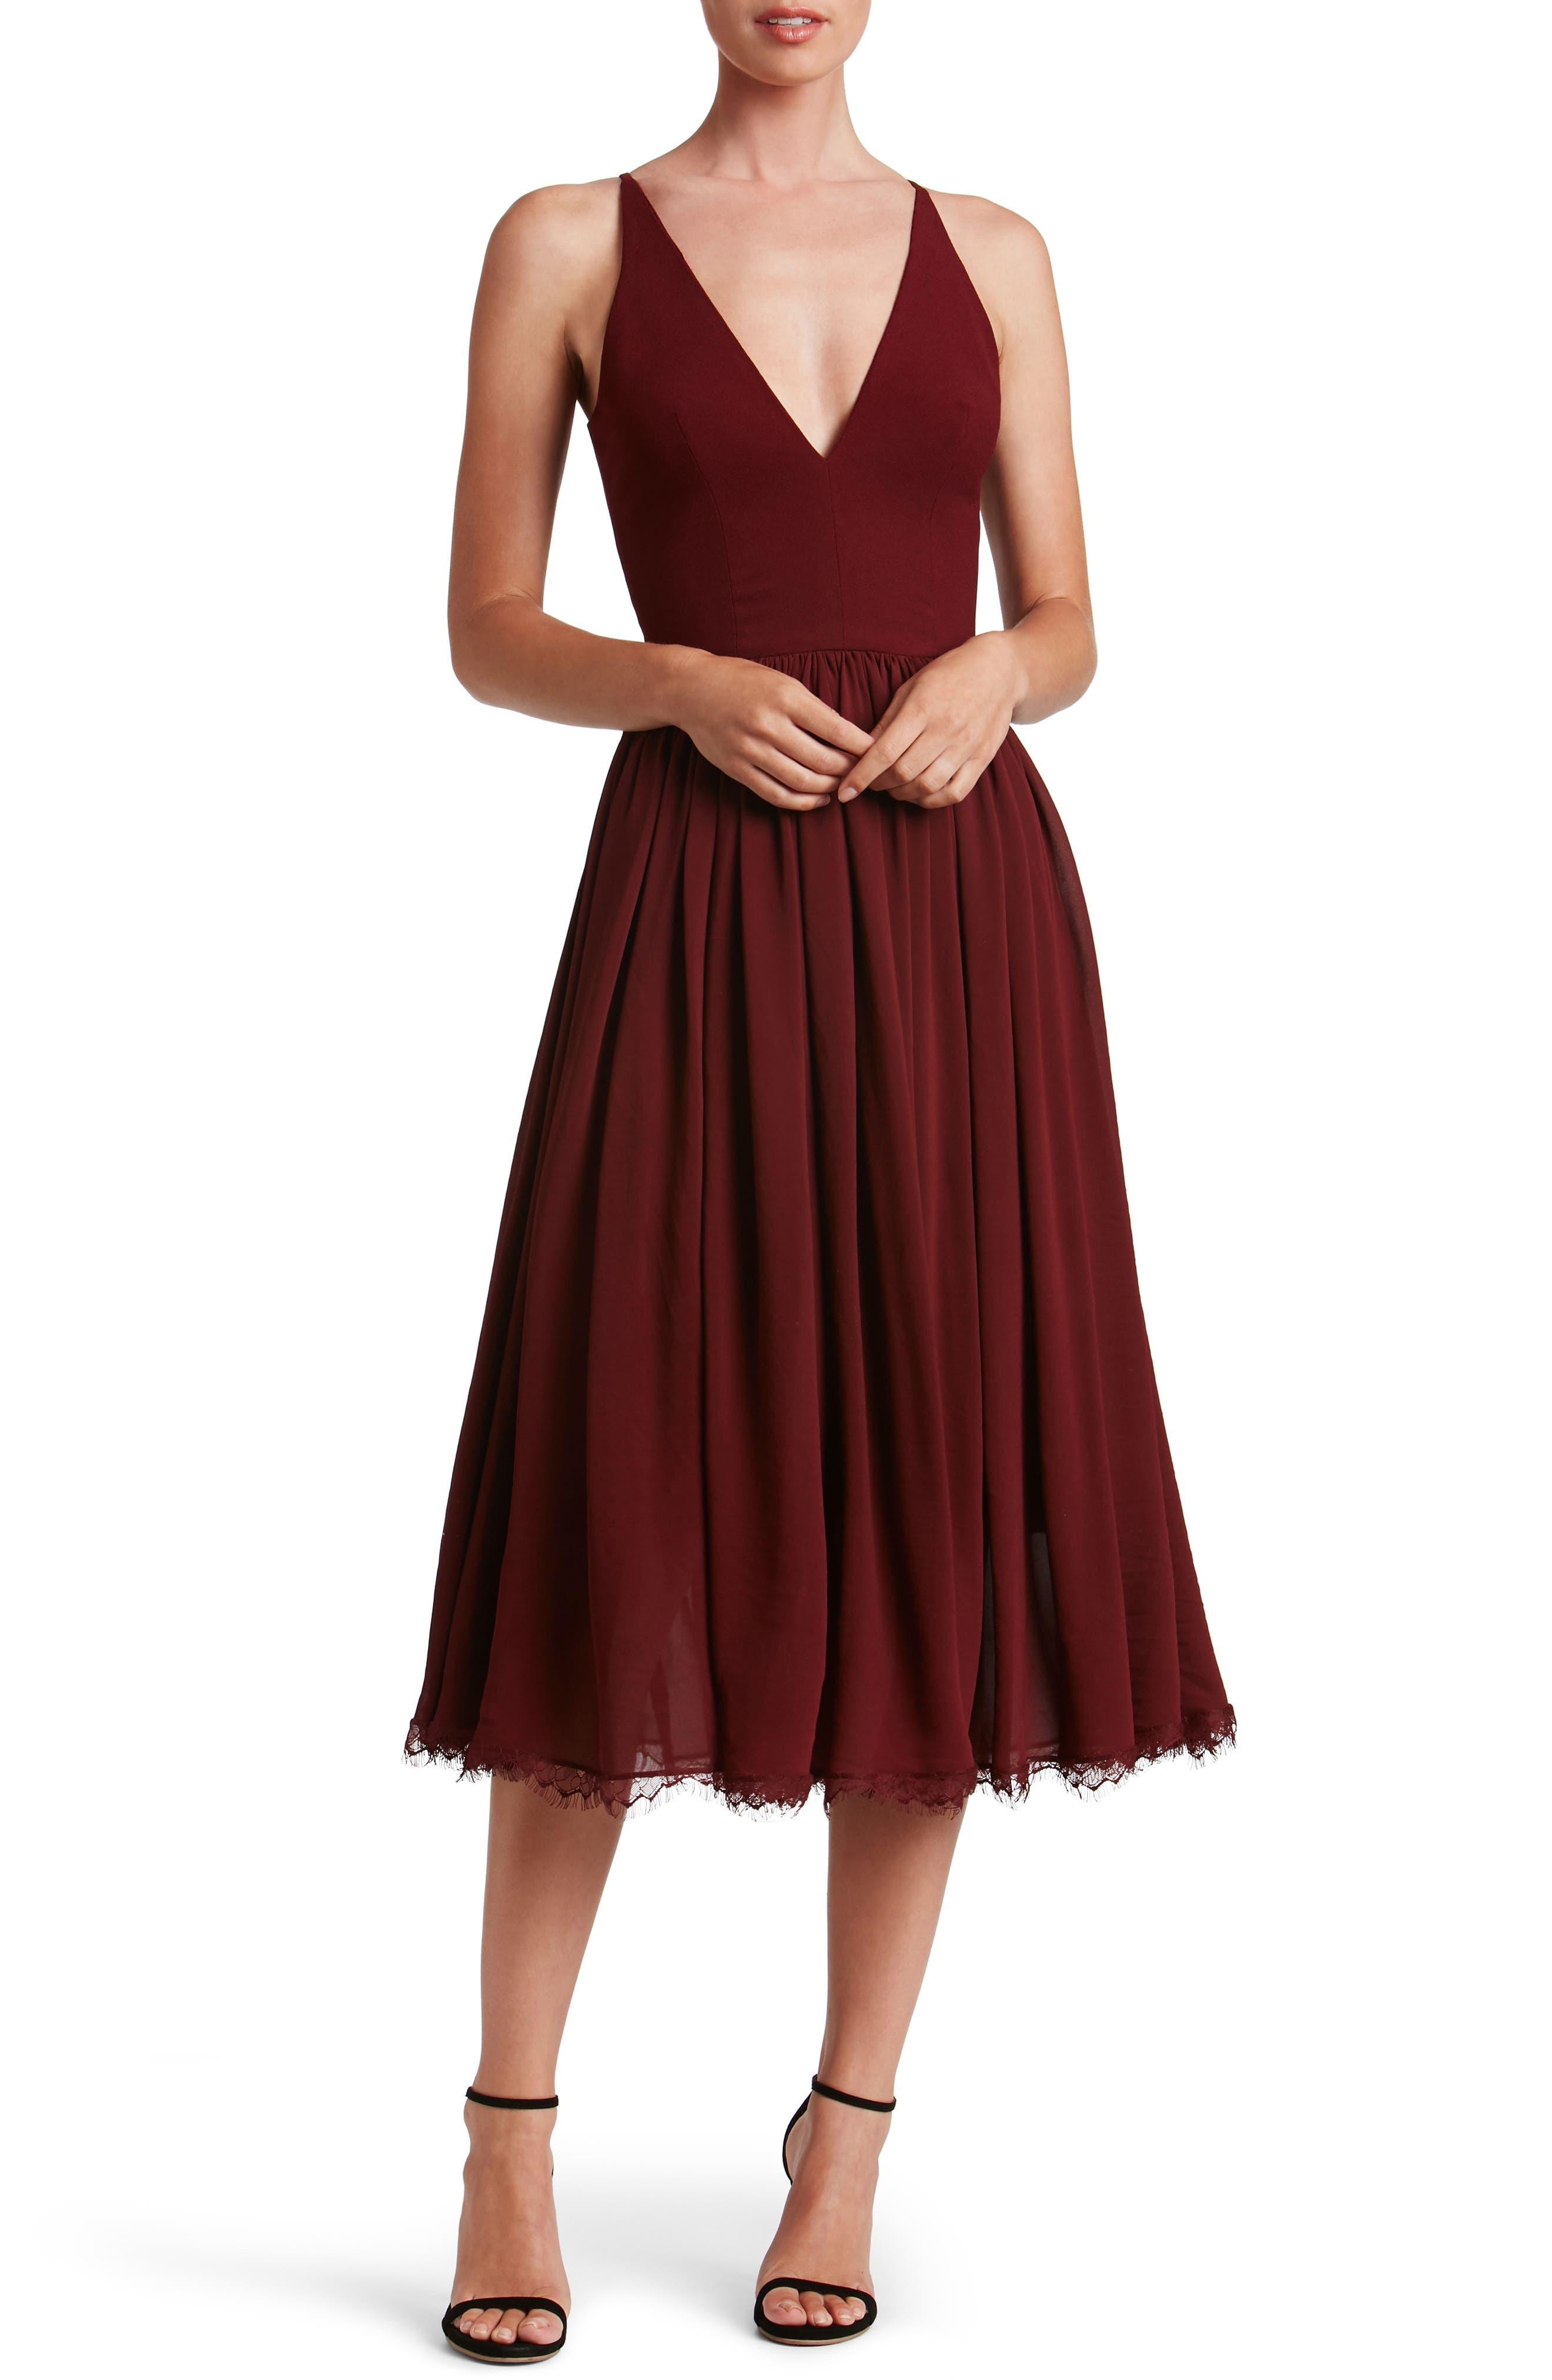 Reddish Brown Dress